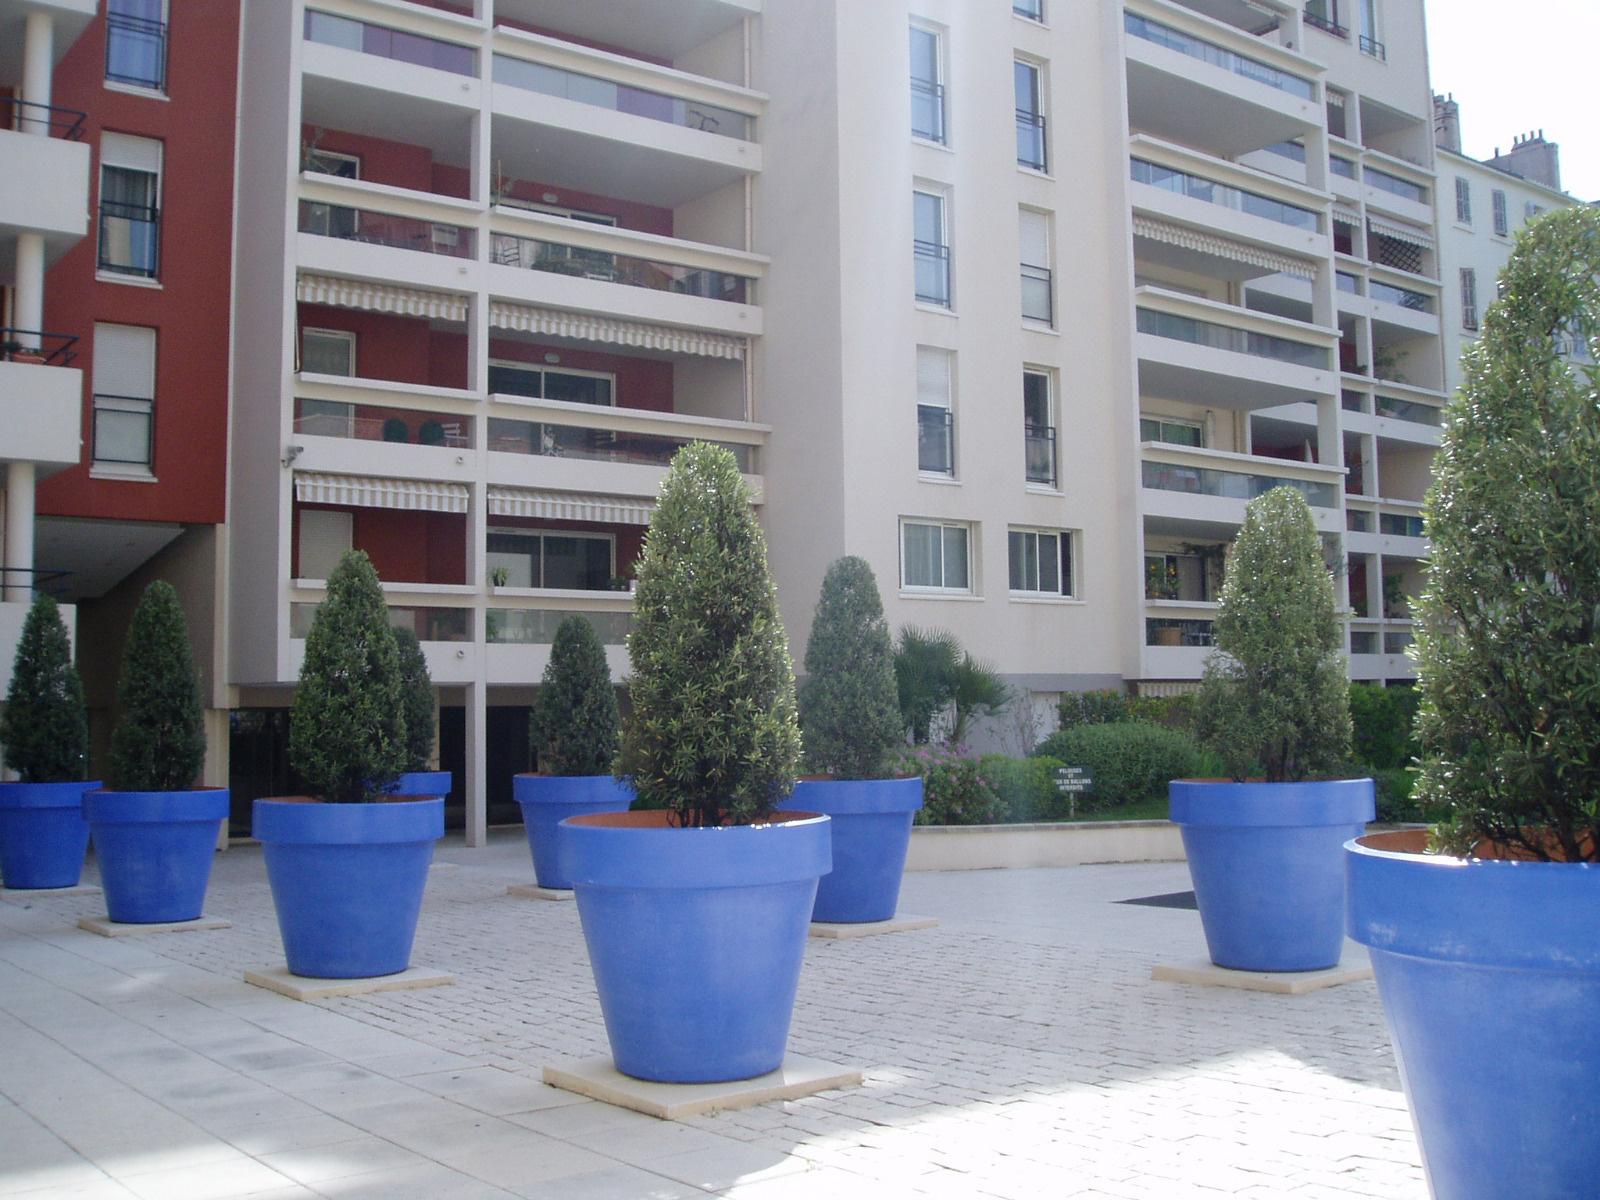 Appartement t2 louer marseille 13006 for Appartement 13006 terrasse